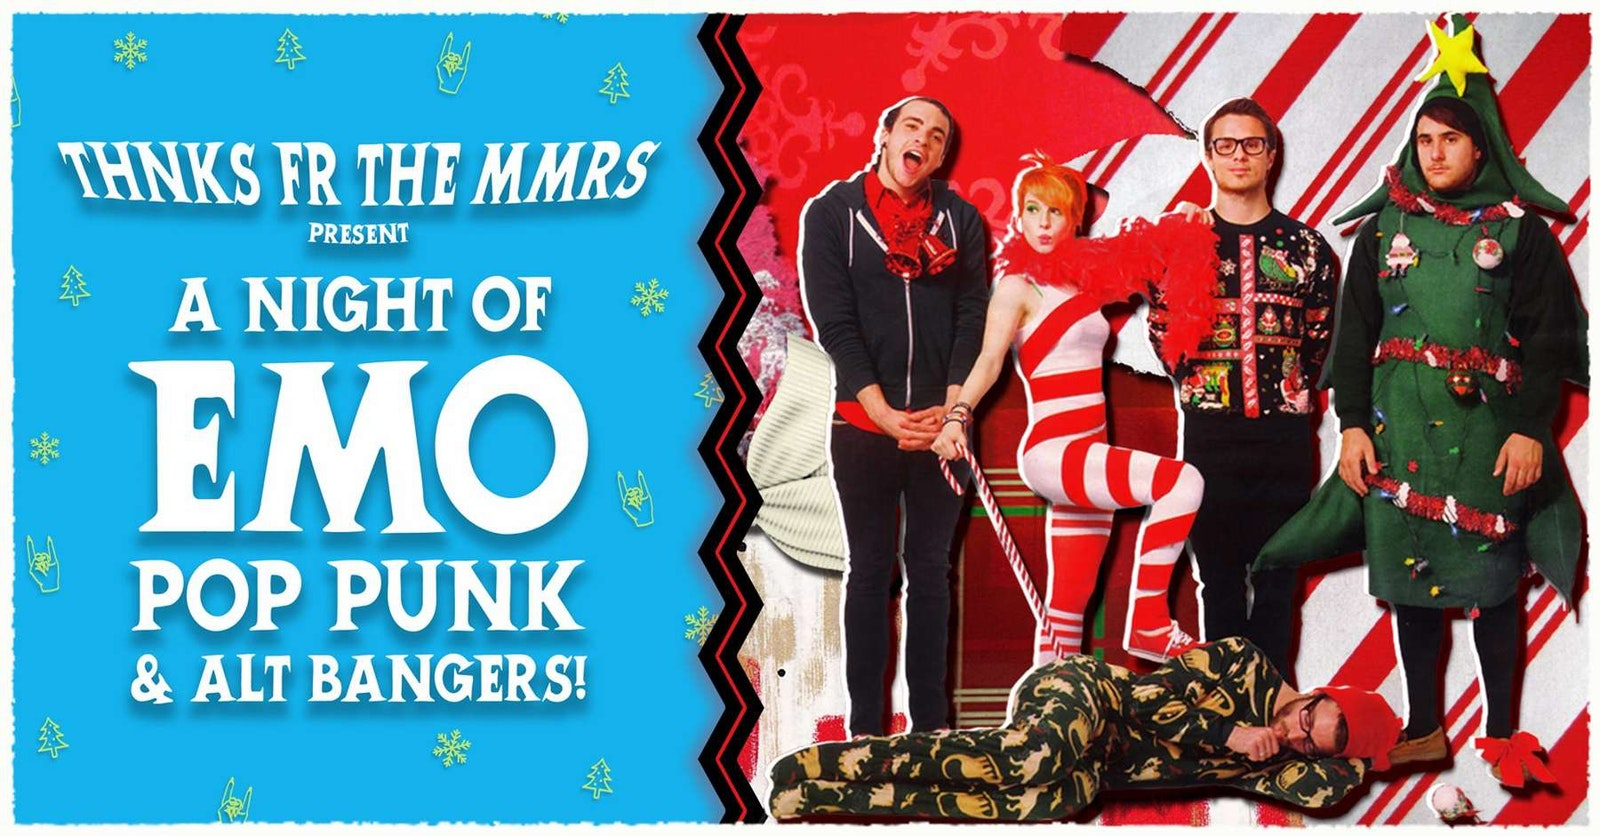 THNKS FR THE MMRS : XMAS EMO NIGHT!